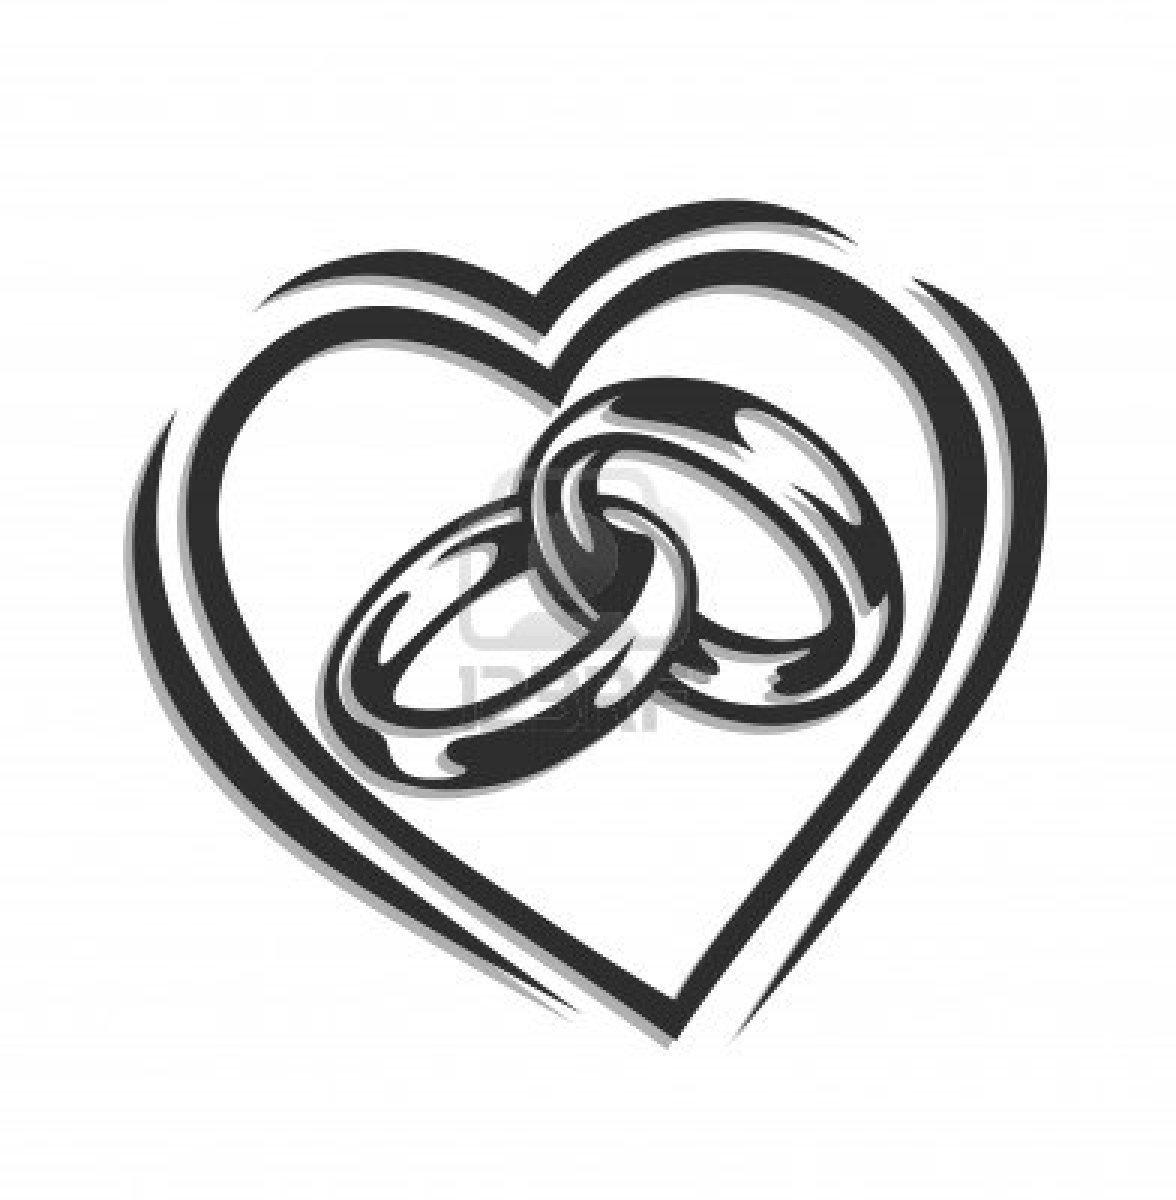 Interlocking wedding ring clipart graphic library download Interlocking wedding rings pin interlocking wedding rings clip ... graphic library download